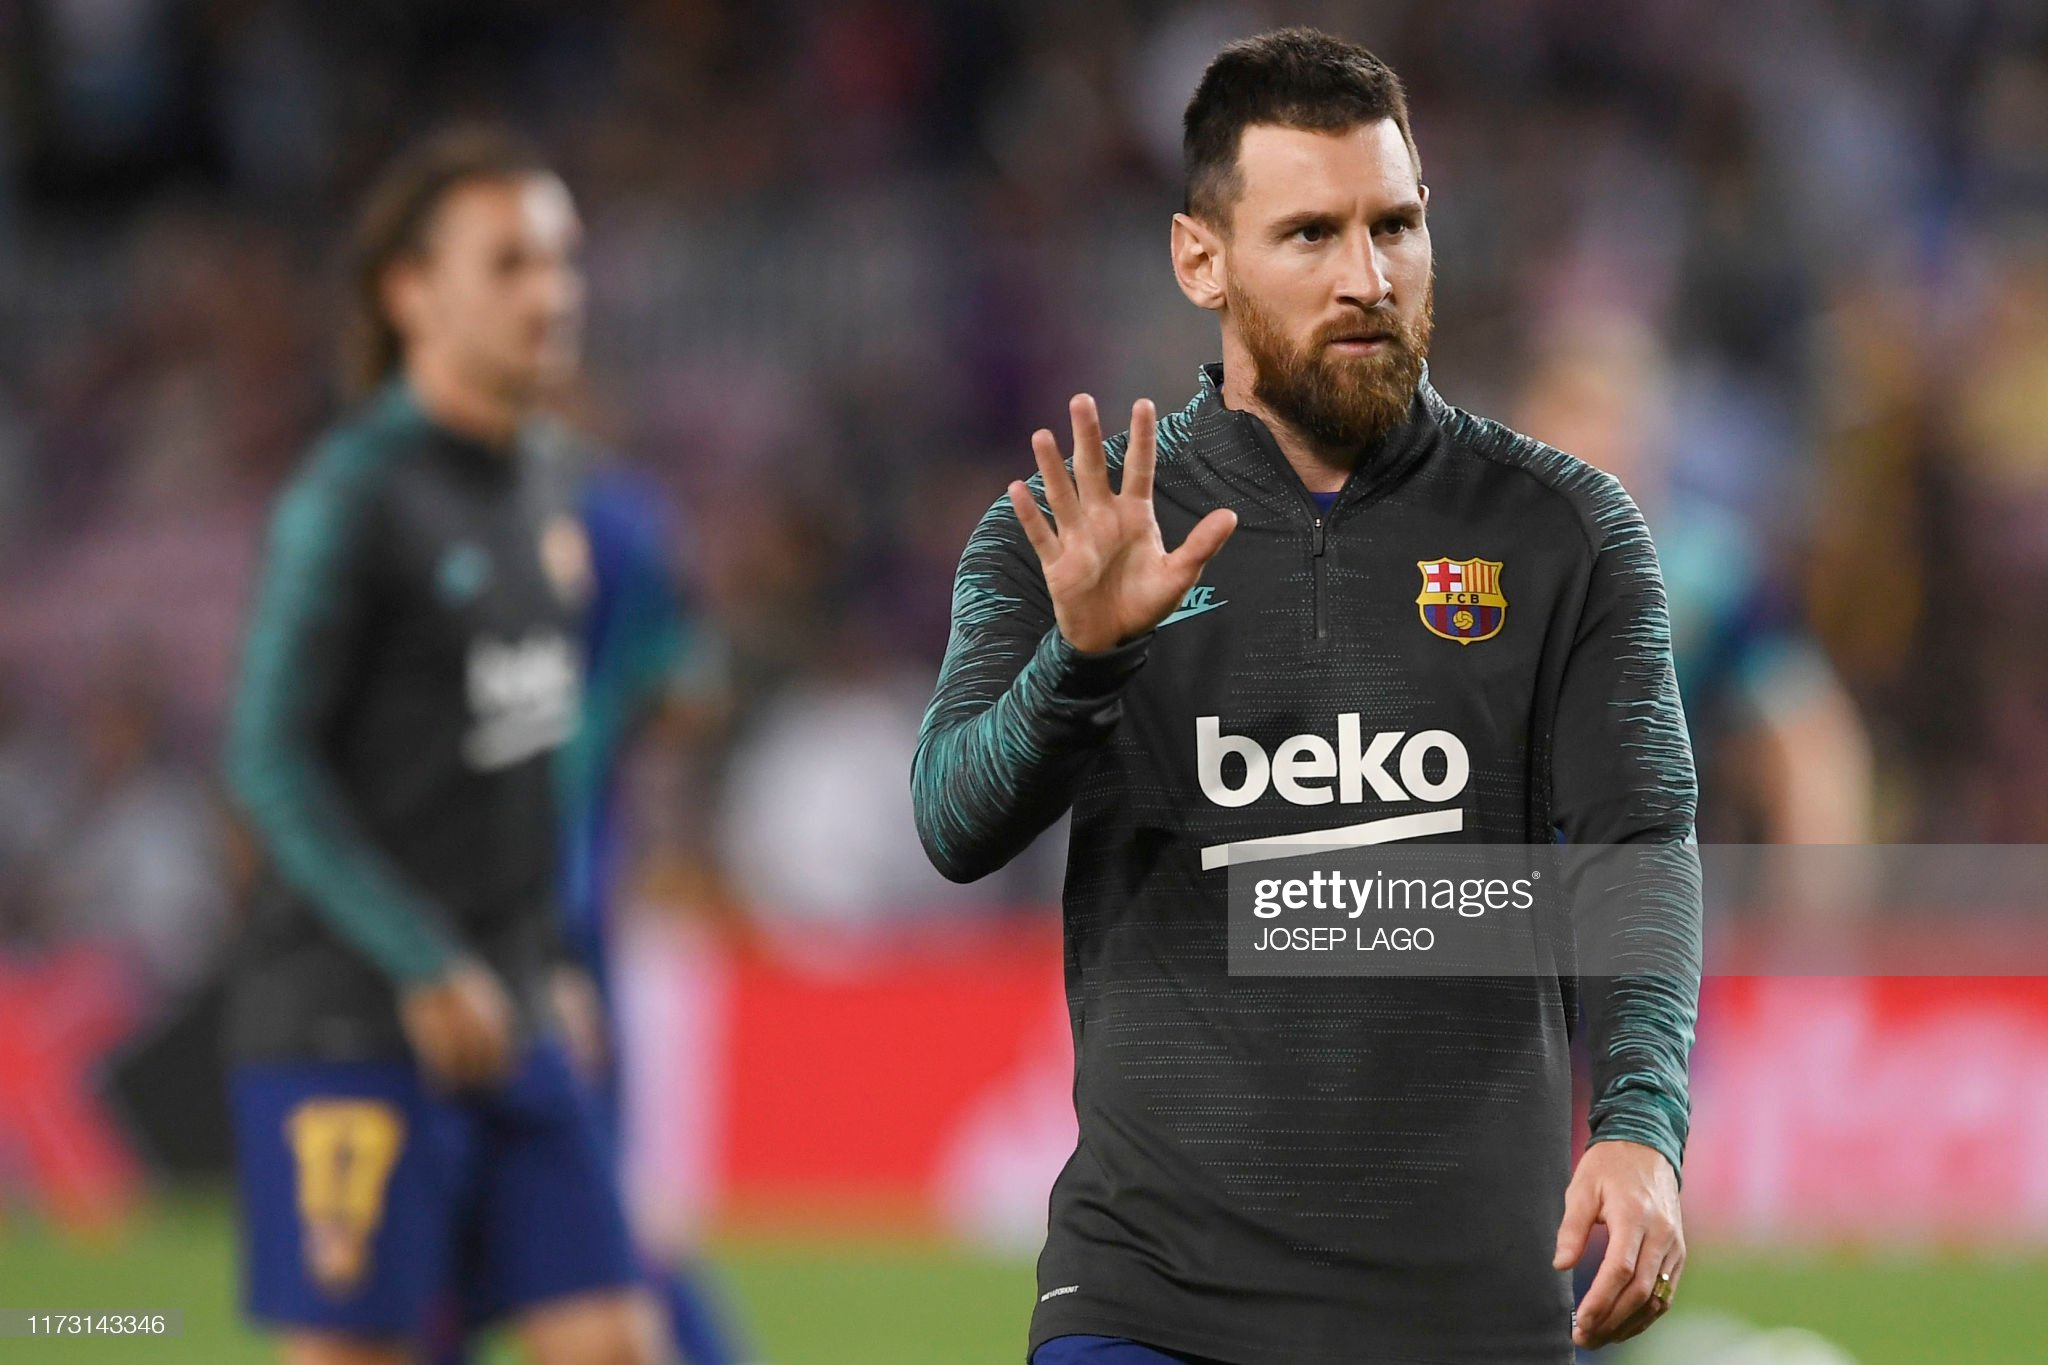 صور مباراة : برشلونة - إنتر 2-1 ( 02-10-2019 )  Barcelonas-argentine-forward-lionel-messi-warms-up-before-the-uefa-picture-id1173143346?s=2048x2048